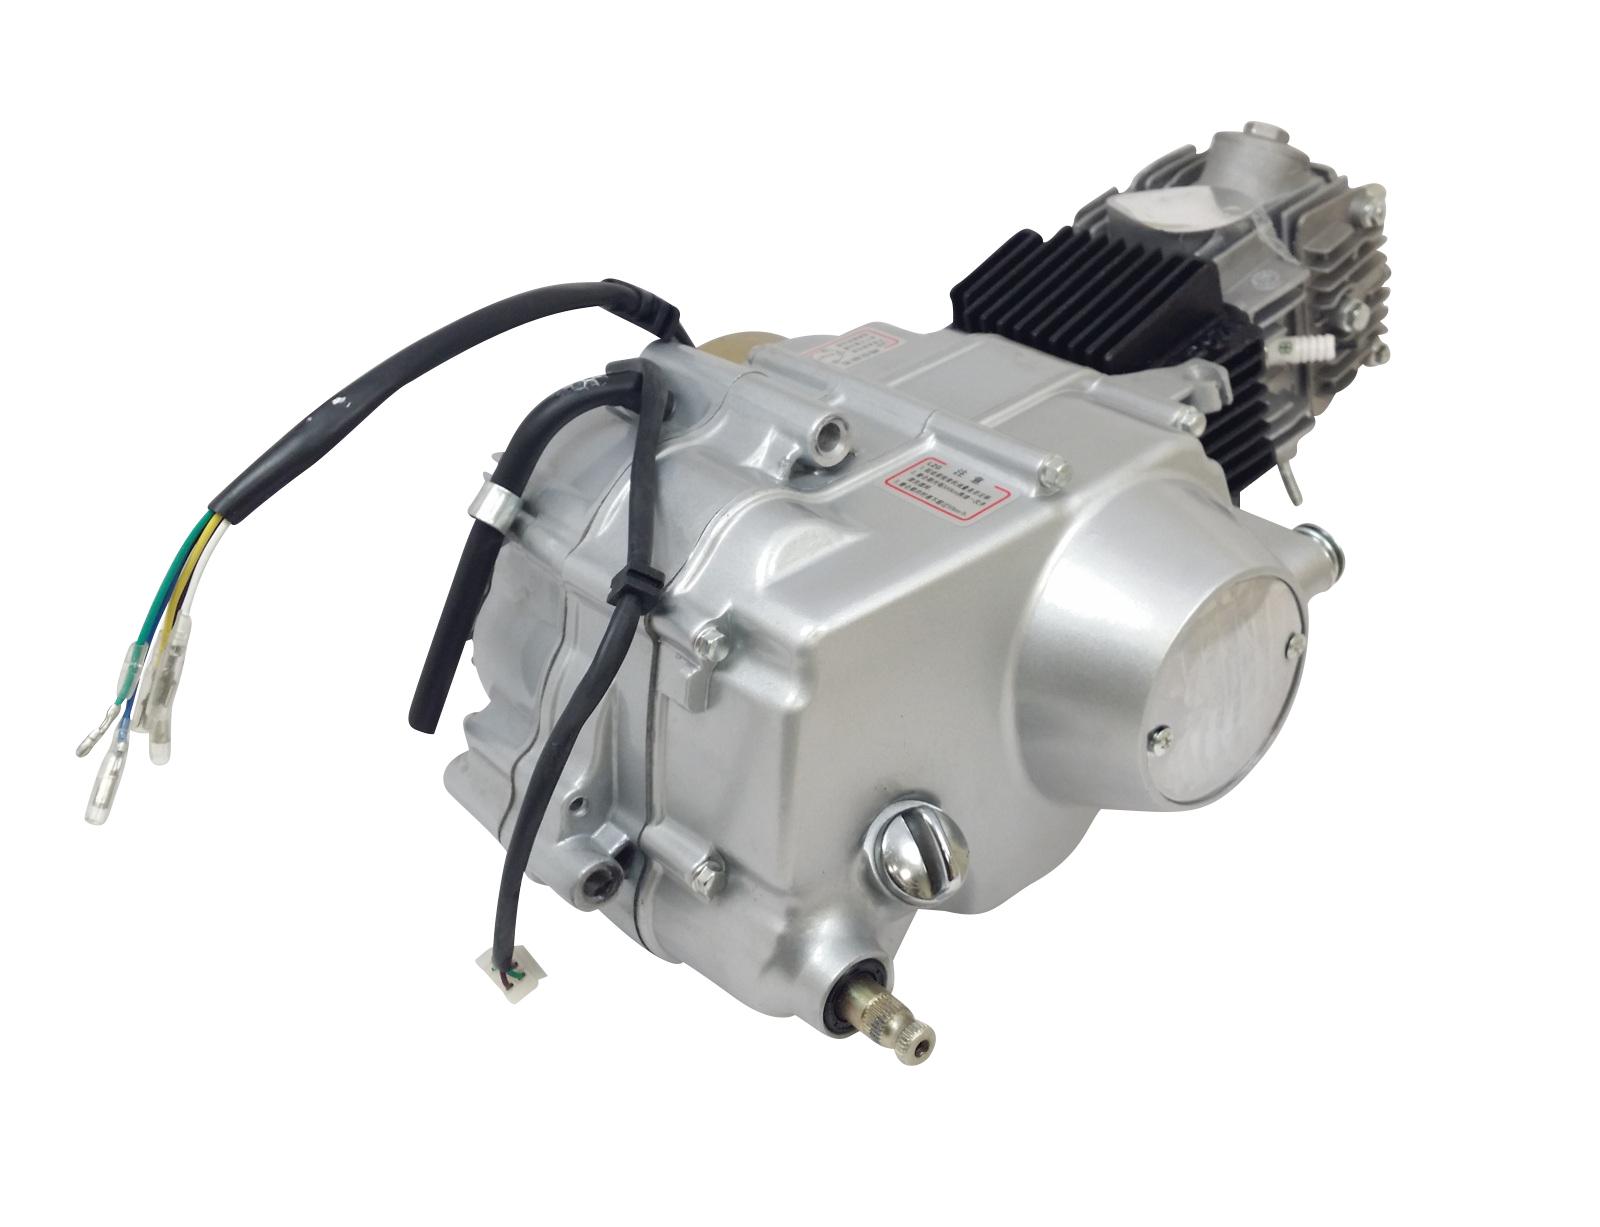 Lifan 125cc Pit Bike Engine 125 Wiring Diagram